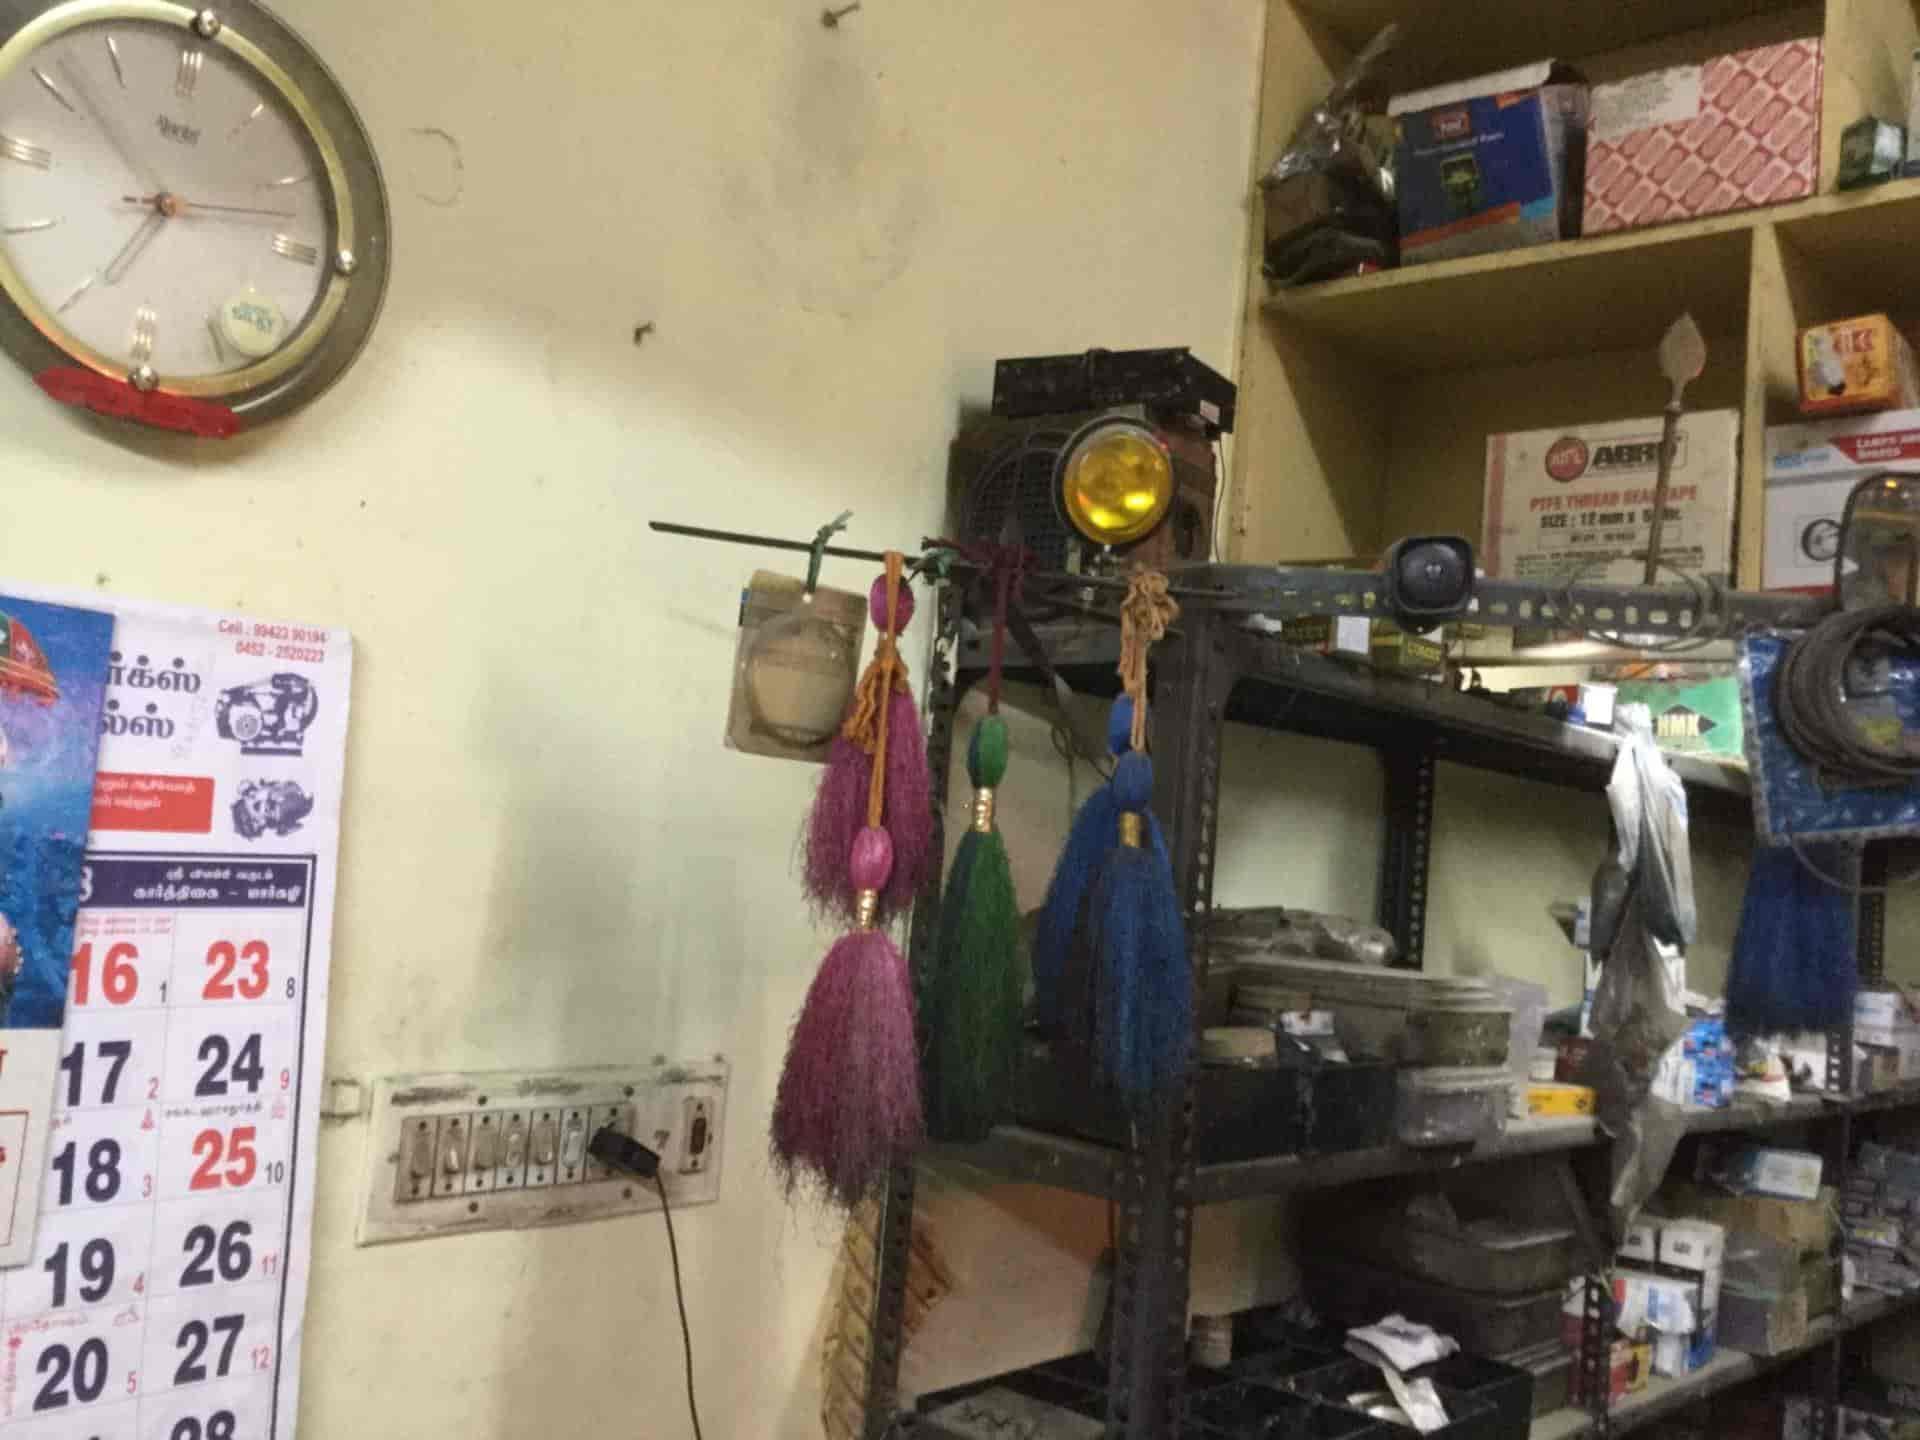 K T Spare Parts Store Photos, Kk Nagar Madurai, Madurai- Pictures